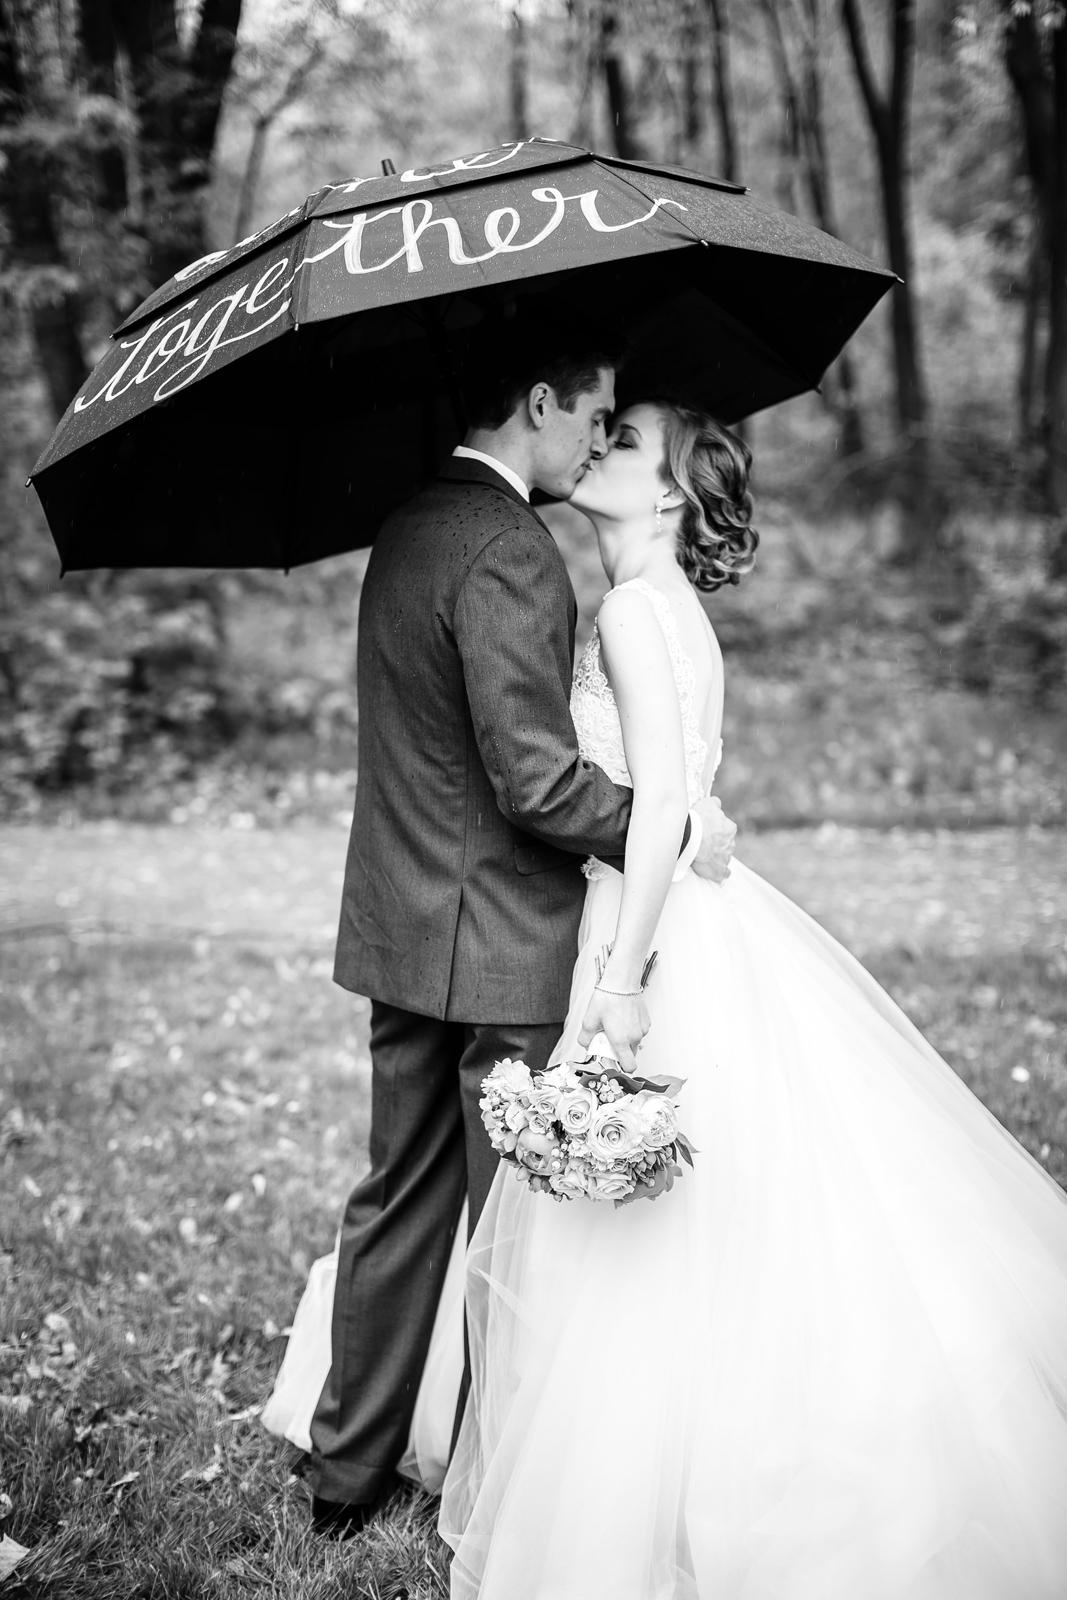 Rain Umbrellas Wedding Day Bride Groom Wedding Party St Louis Wedding Photographer Oldani Photography 2.jpg